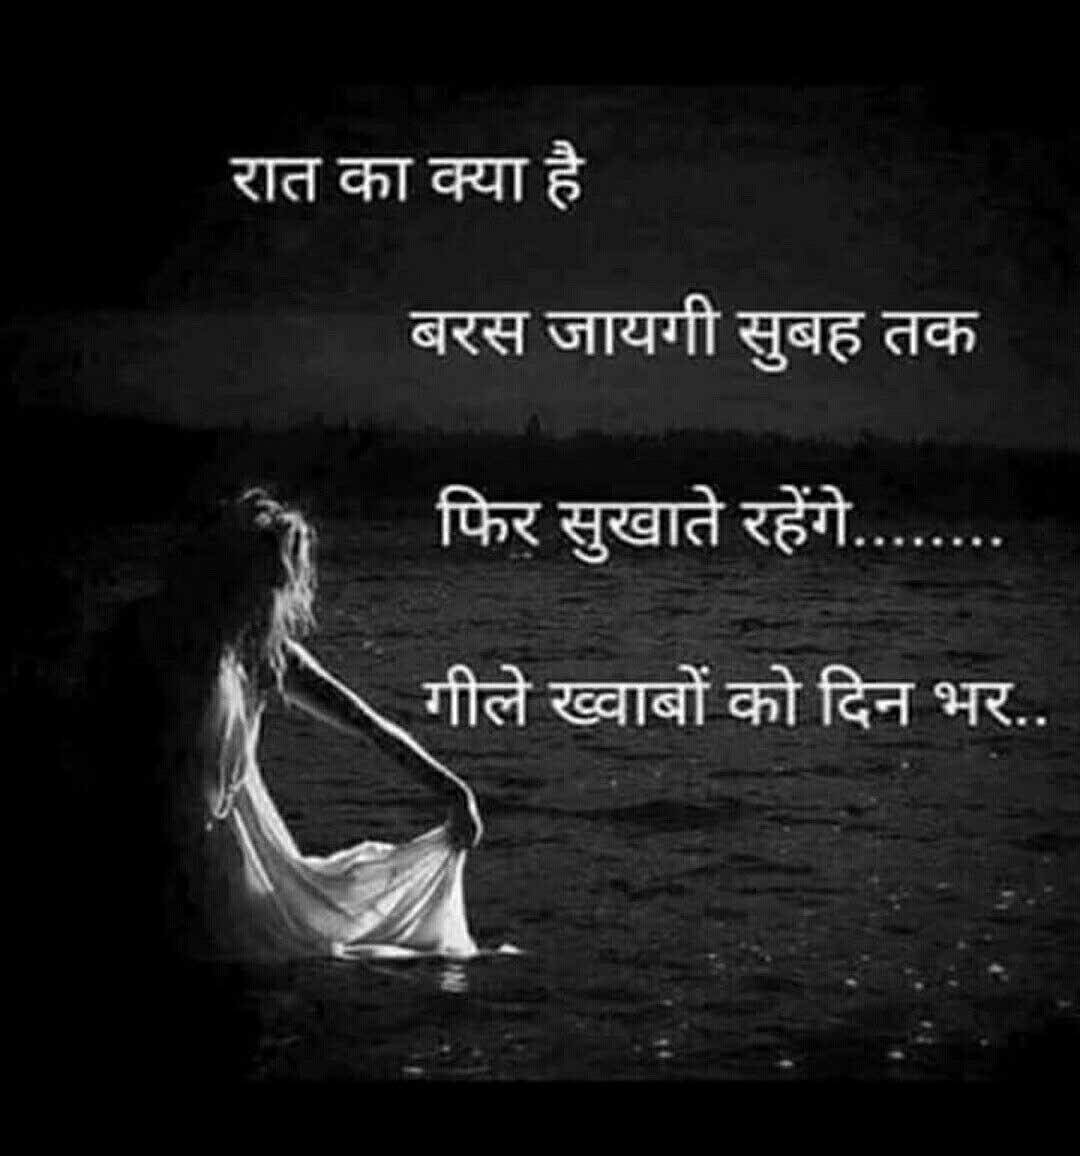 Hindi Quotes Whatsapp DP Images Download